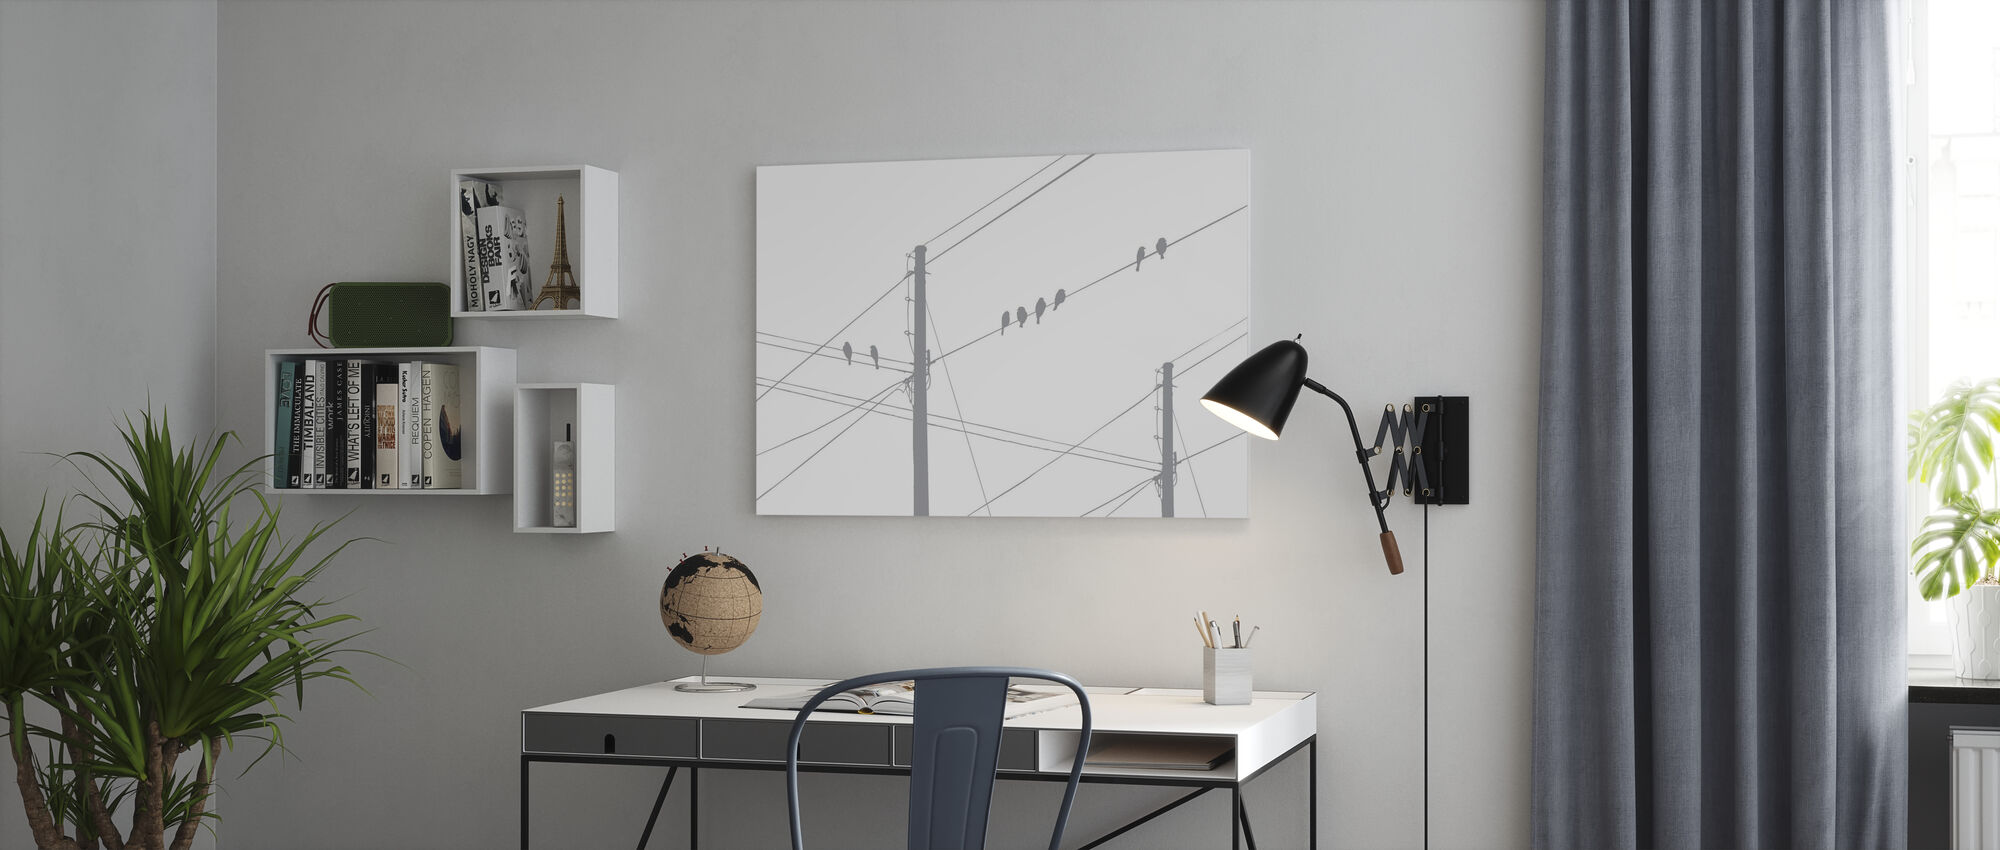 Powerlines - Grigio - Stampa su tela - Uffici